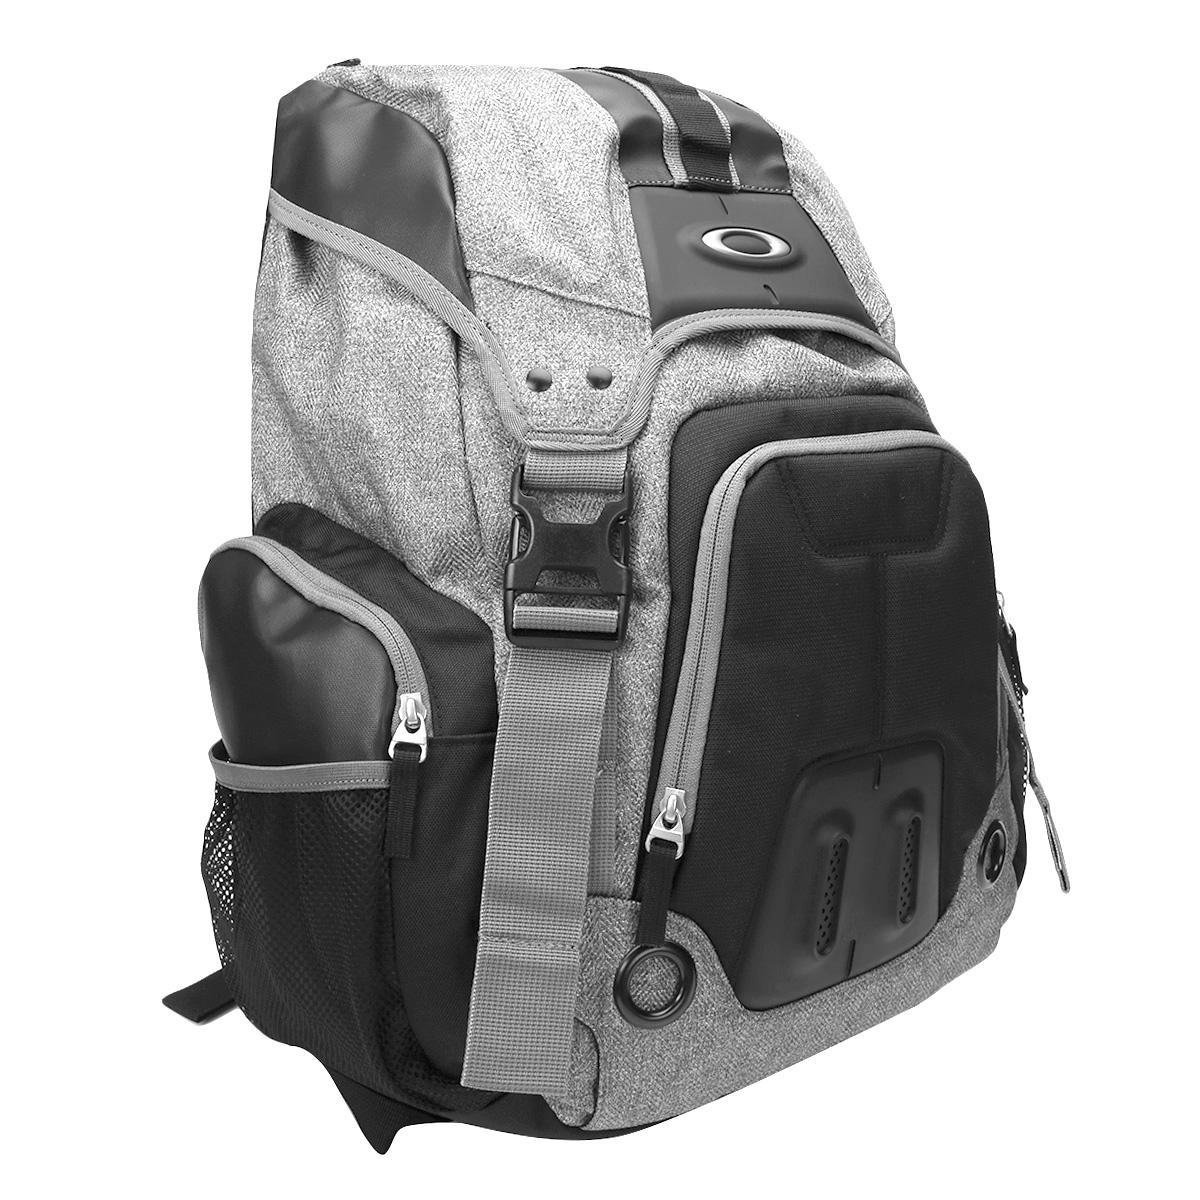 bccc5ac102598 Mochila Oakley Gearbox LX Plus - Compre Agora